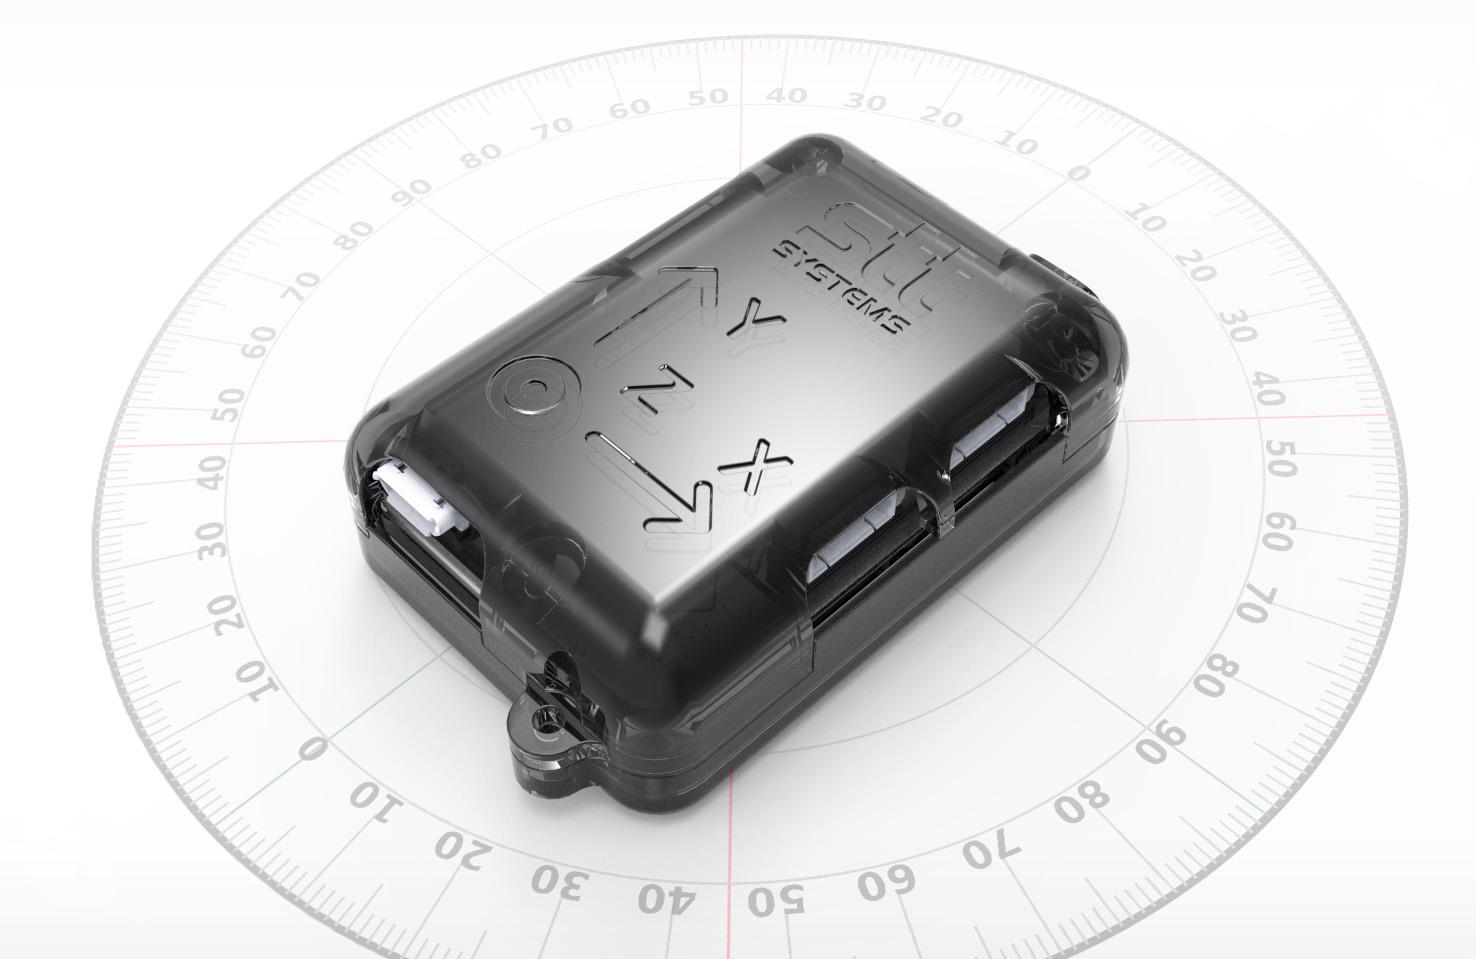 IMU Sensor